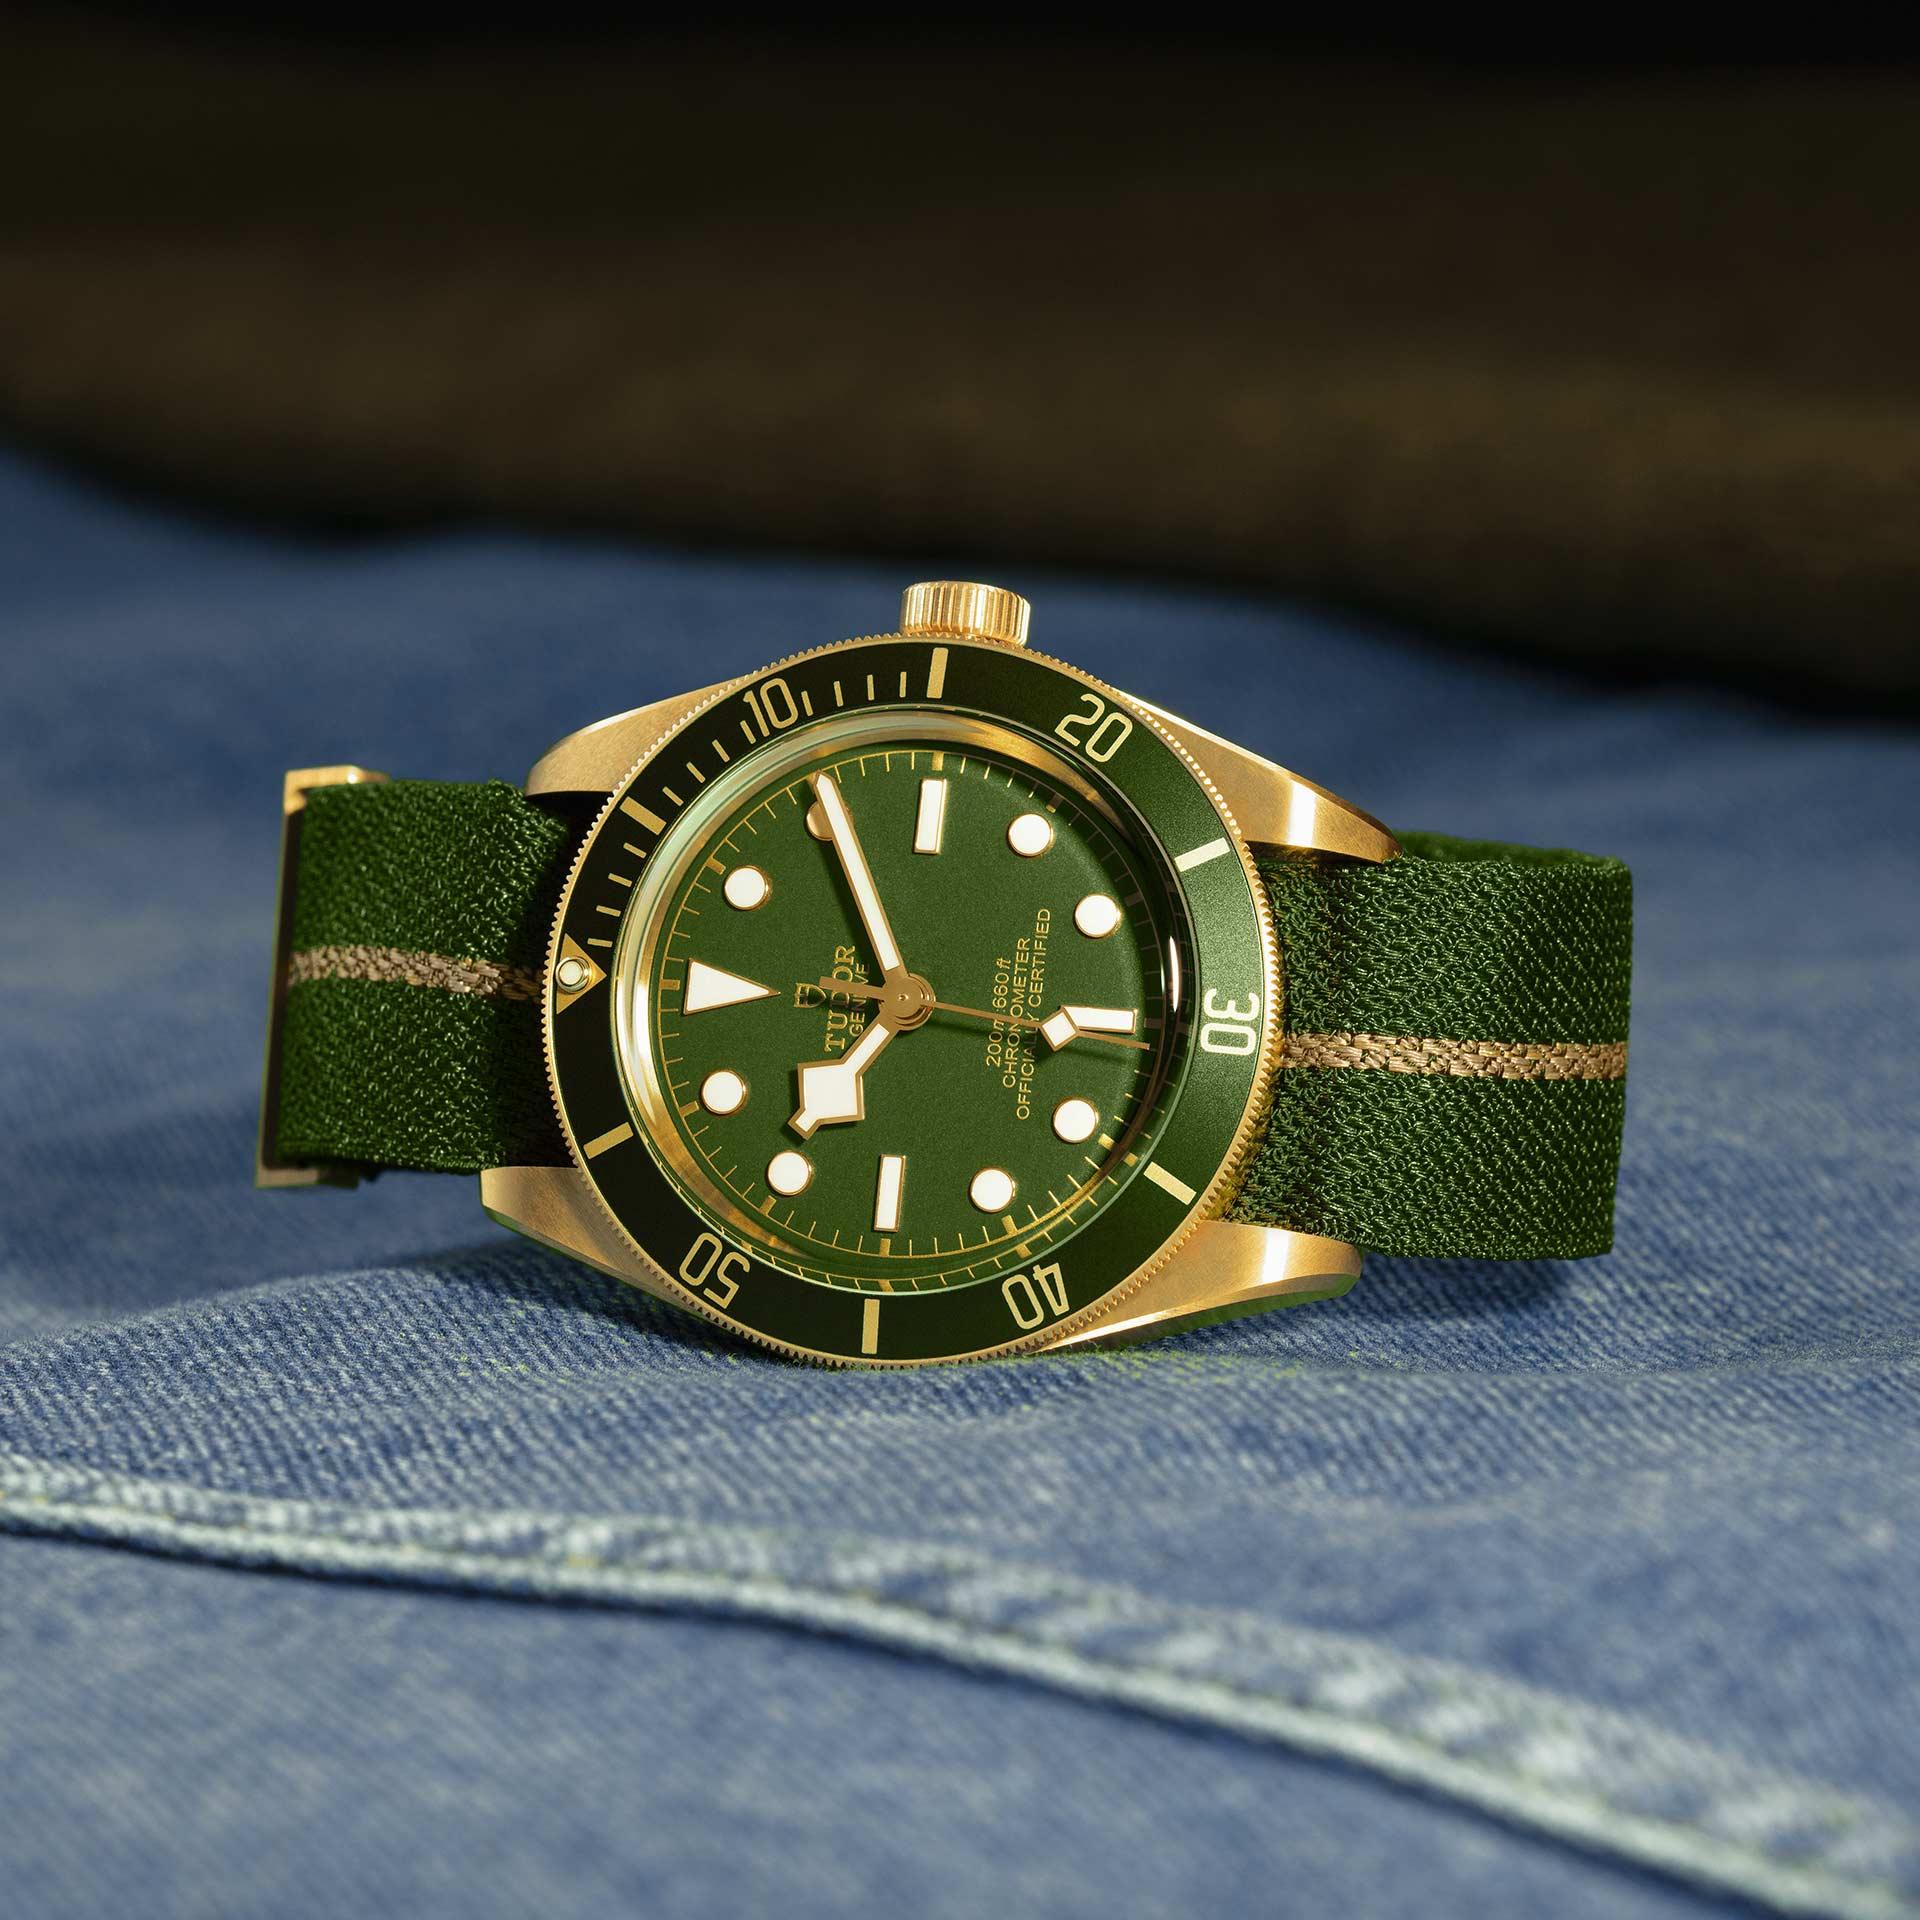 Tudor Black Bay Fifty-Eight 18K M79018V-0001 Lifestyle correa complementaria